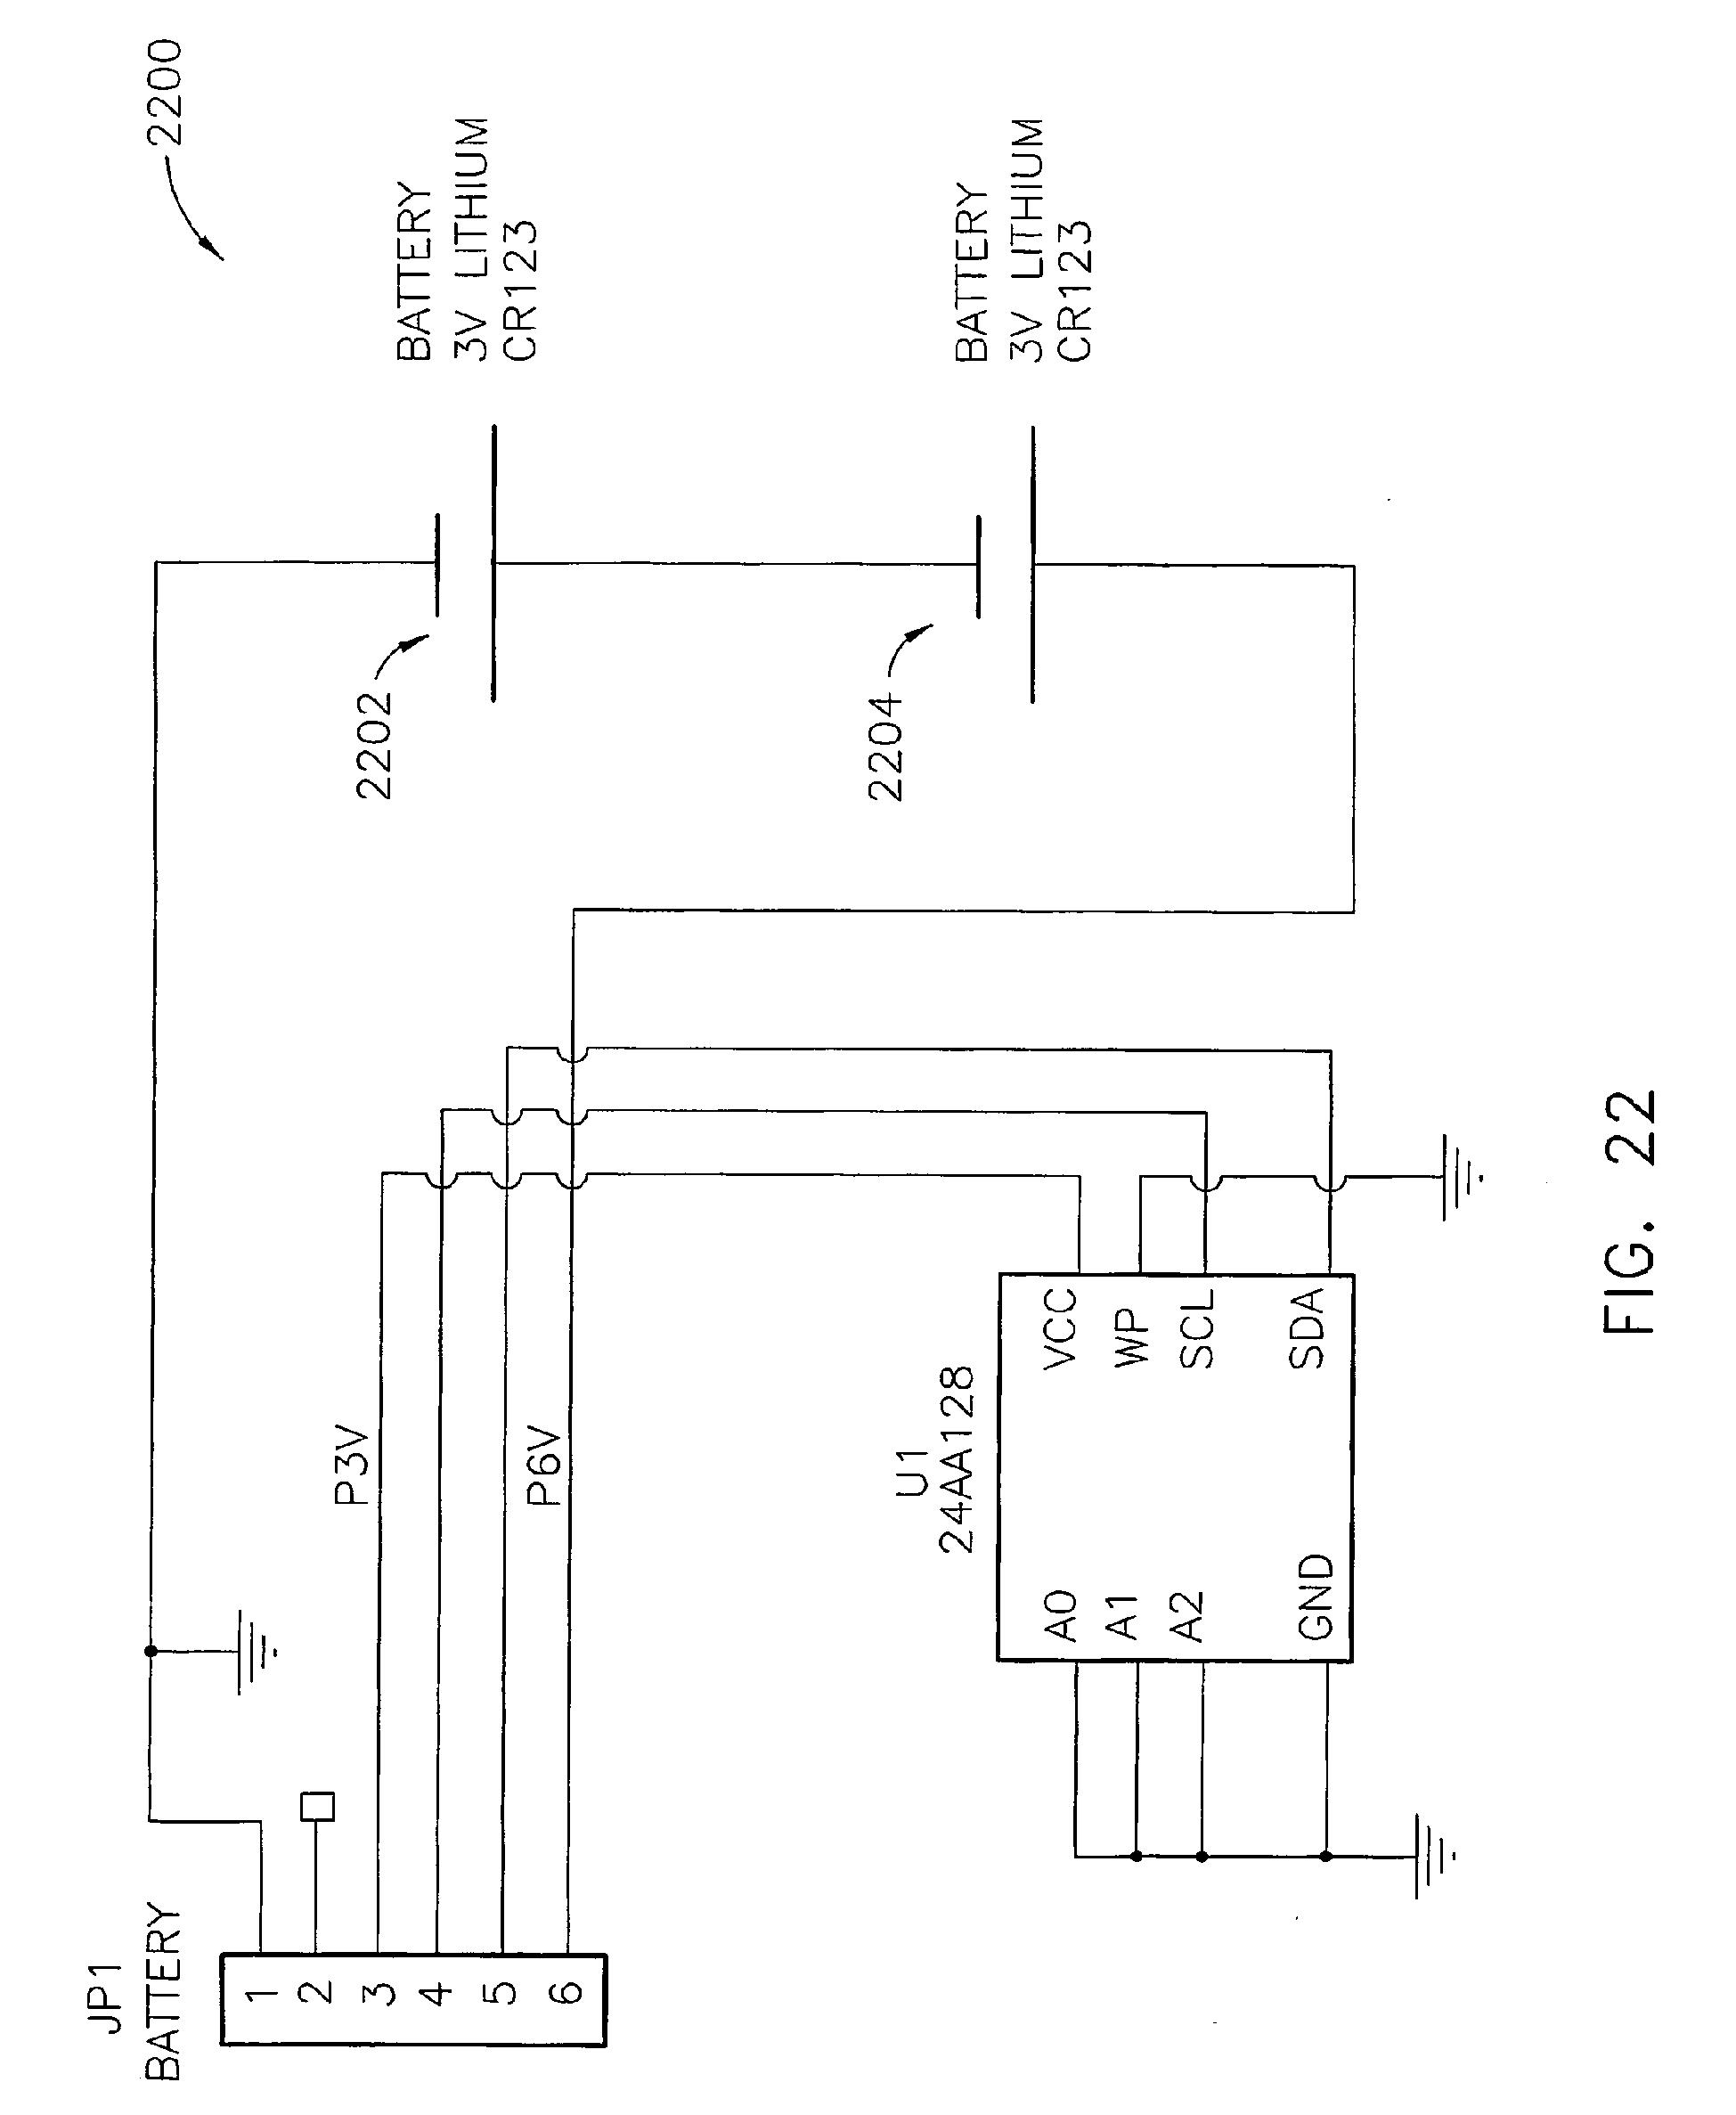 DIAGRAM] Kz1000 Police Wiring Diagram FULL Version HD Quality Wiring Diagram  - LADDERDIAGRAM.NUITDEBOUTAIX.FR